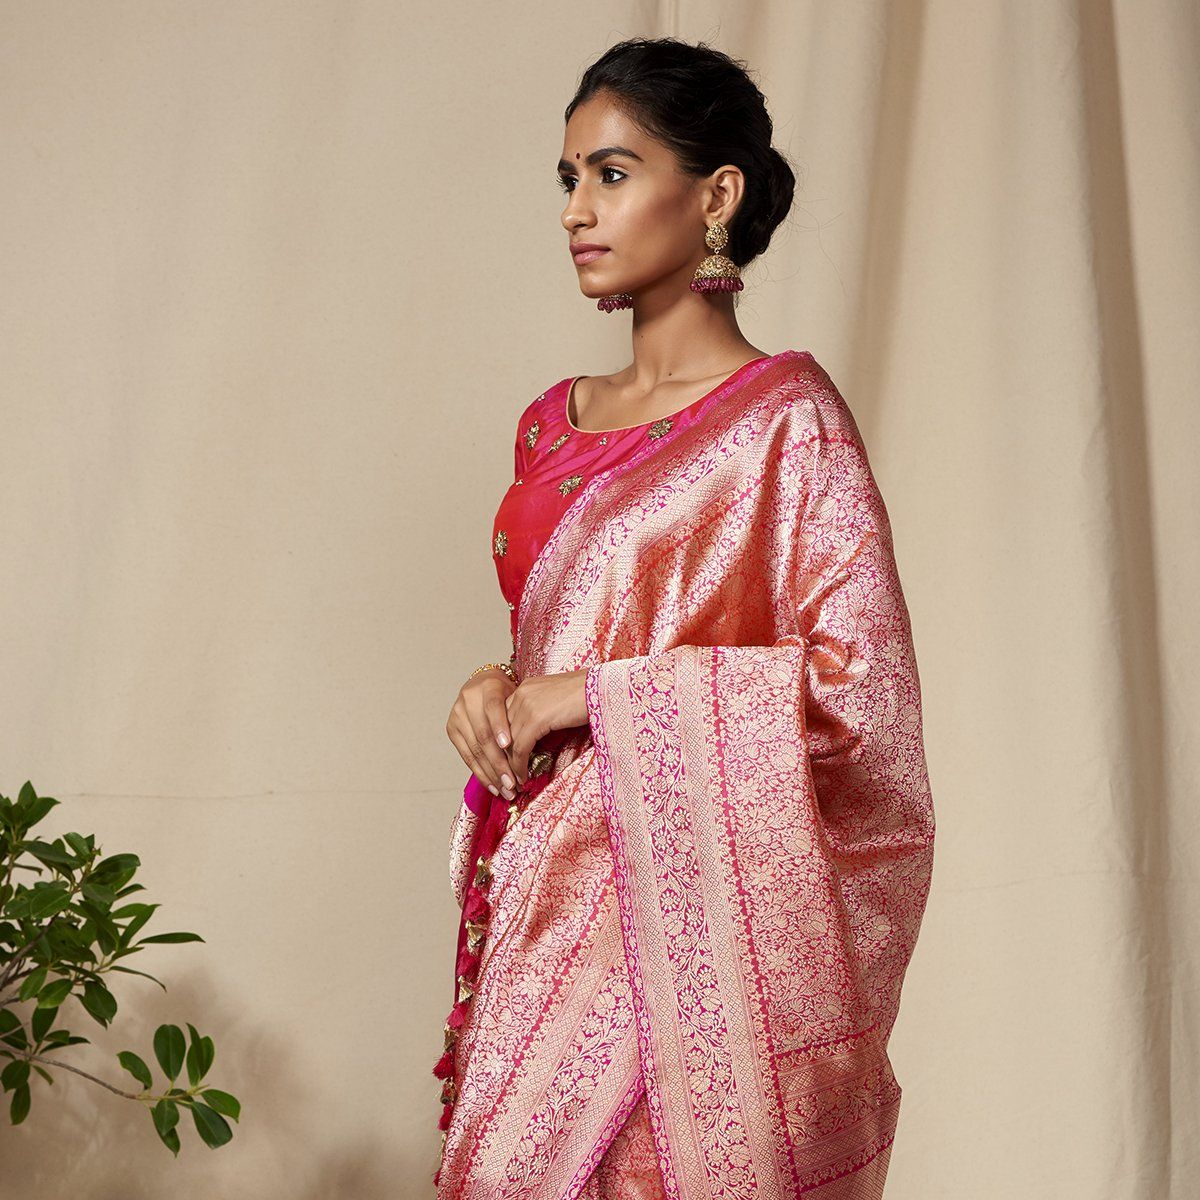 Black Exclusive Durga Puja Zari Work Pure Chiffon Banarasi Silk Handwoven Saree Designer Weaving Fabric Sari Women Running Blouse Pece